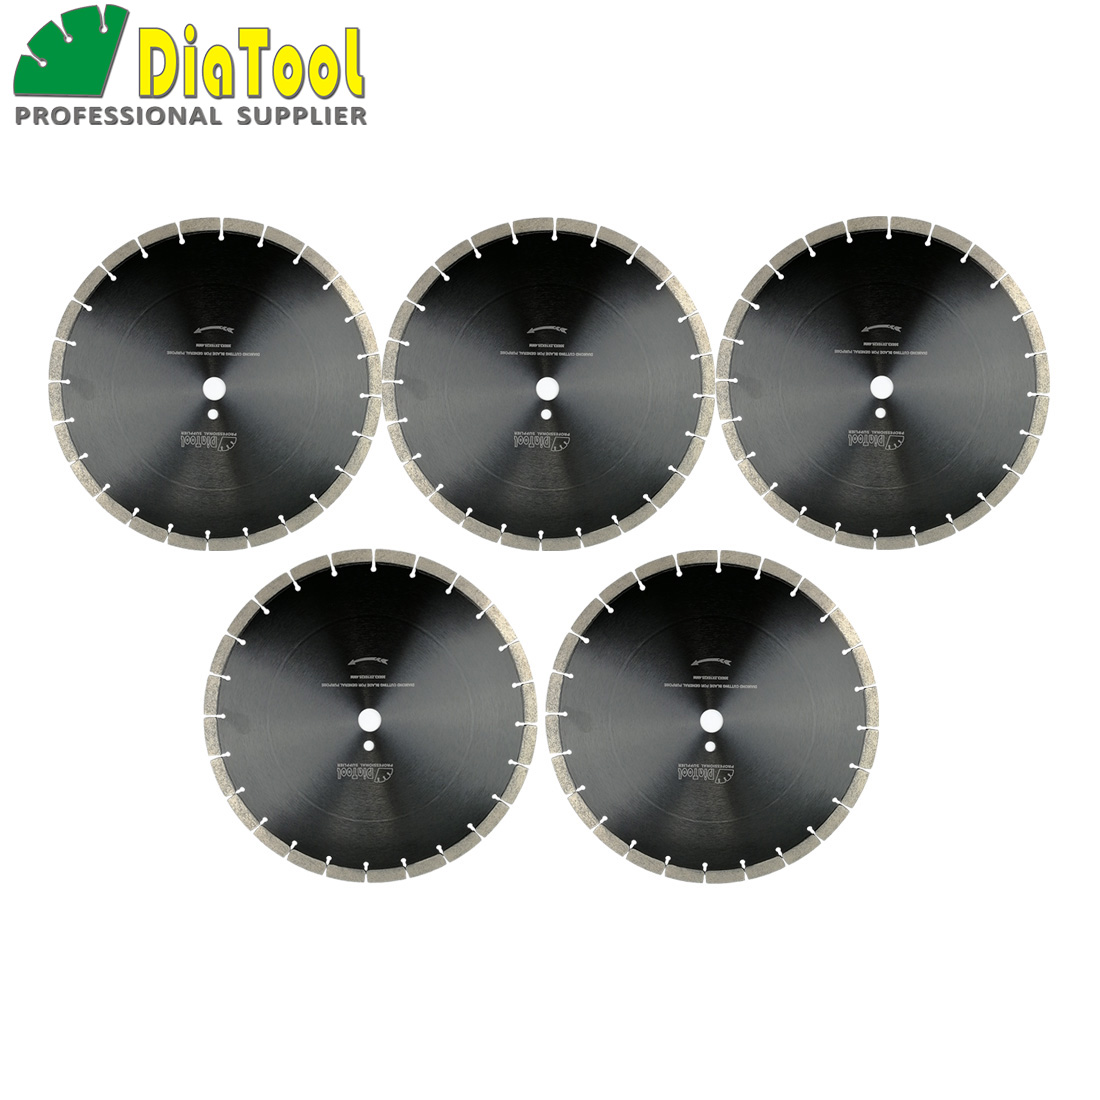 DIATOOL 5pcs 14inch Sintered Segmented Diamond Blade Cutting Disc Circular Saw Blades Dia360mm Concrete Blade Diamond Wheel Disk